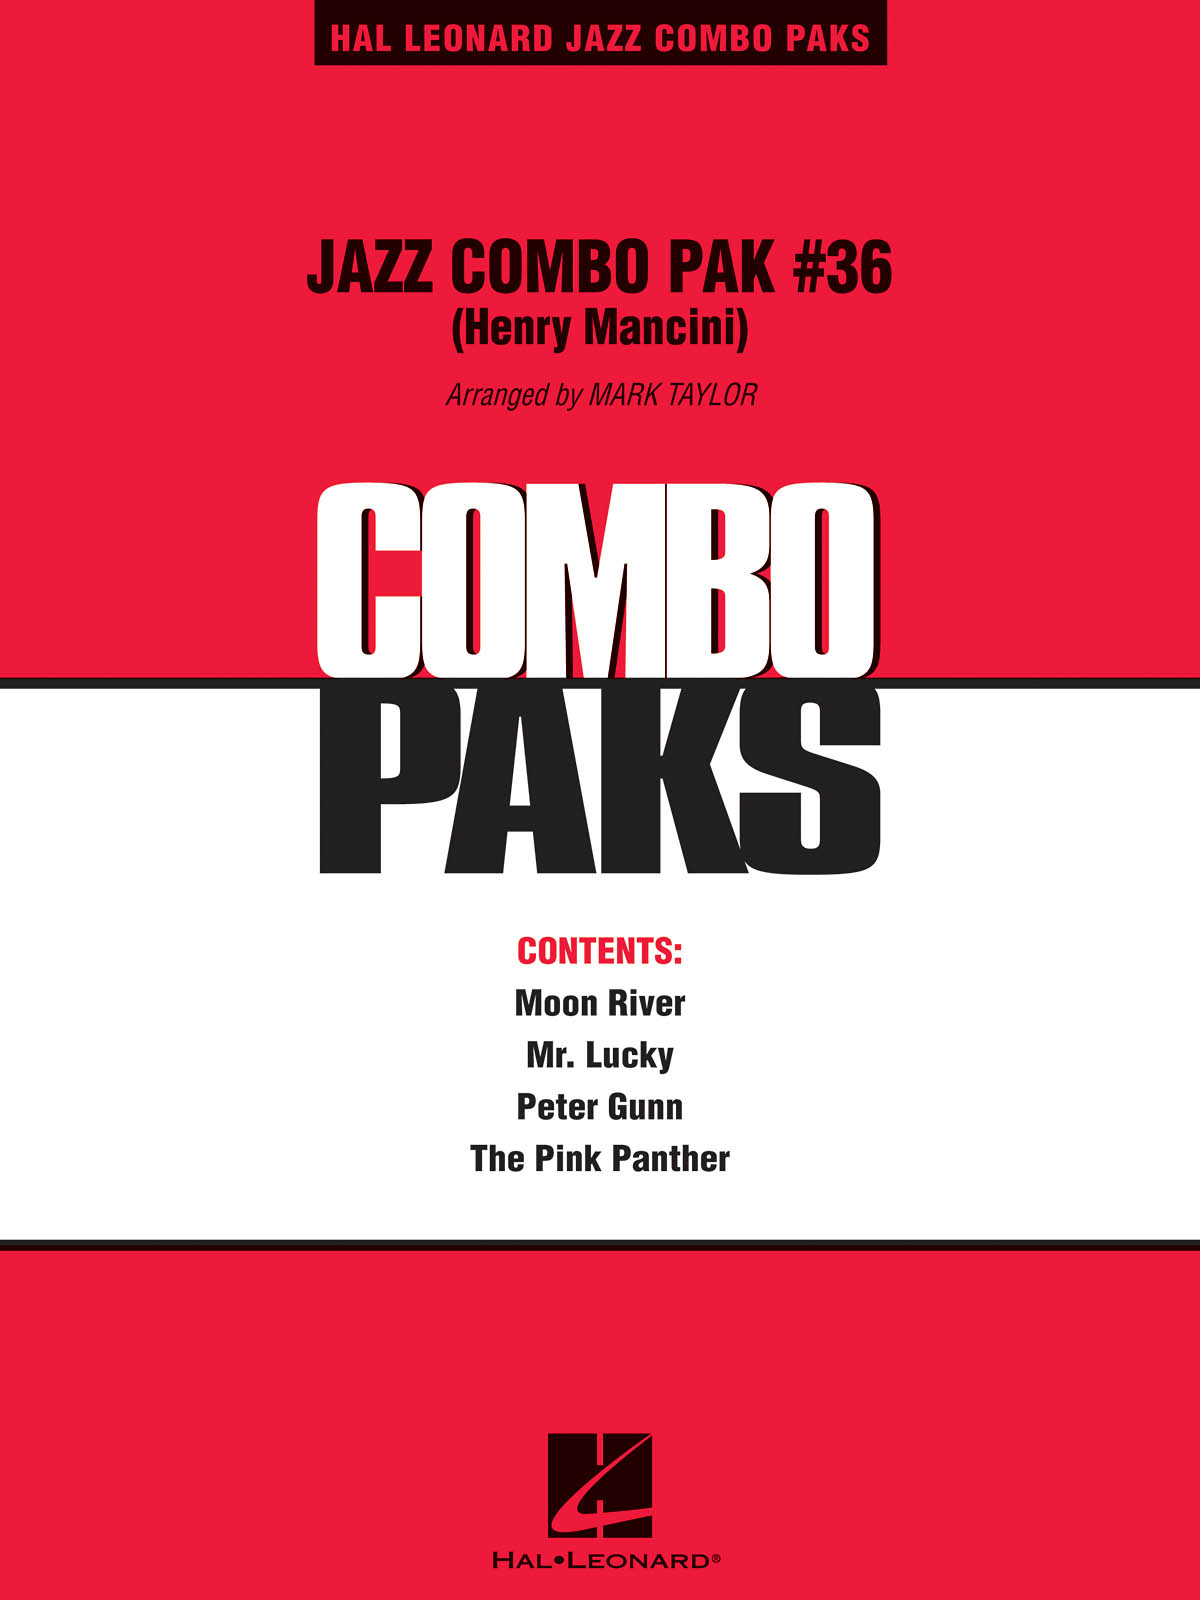 Jazz Combo Pak #36 (Henry Mancini)